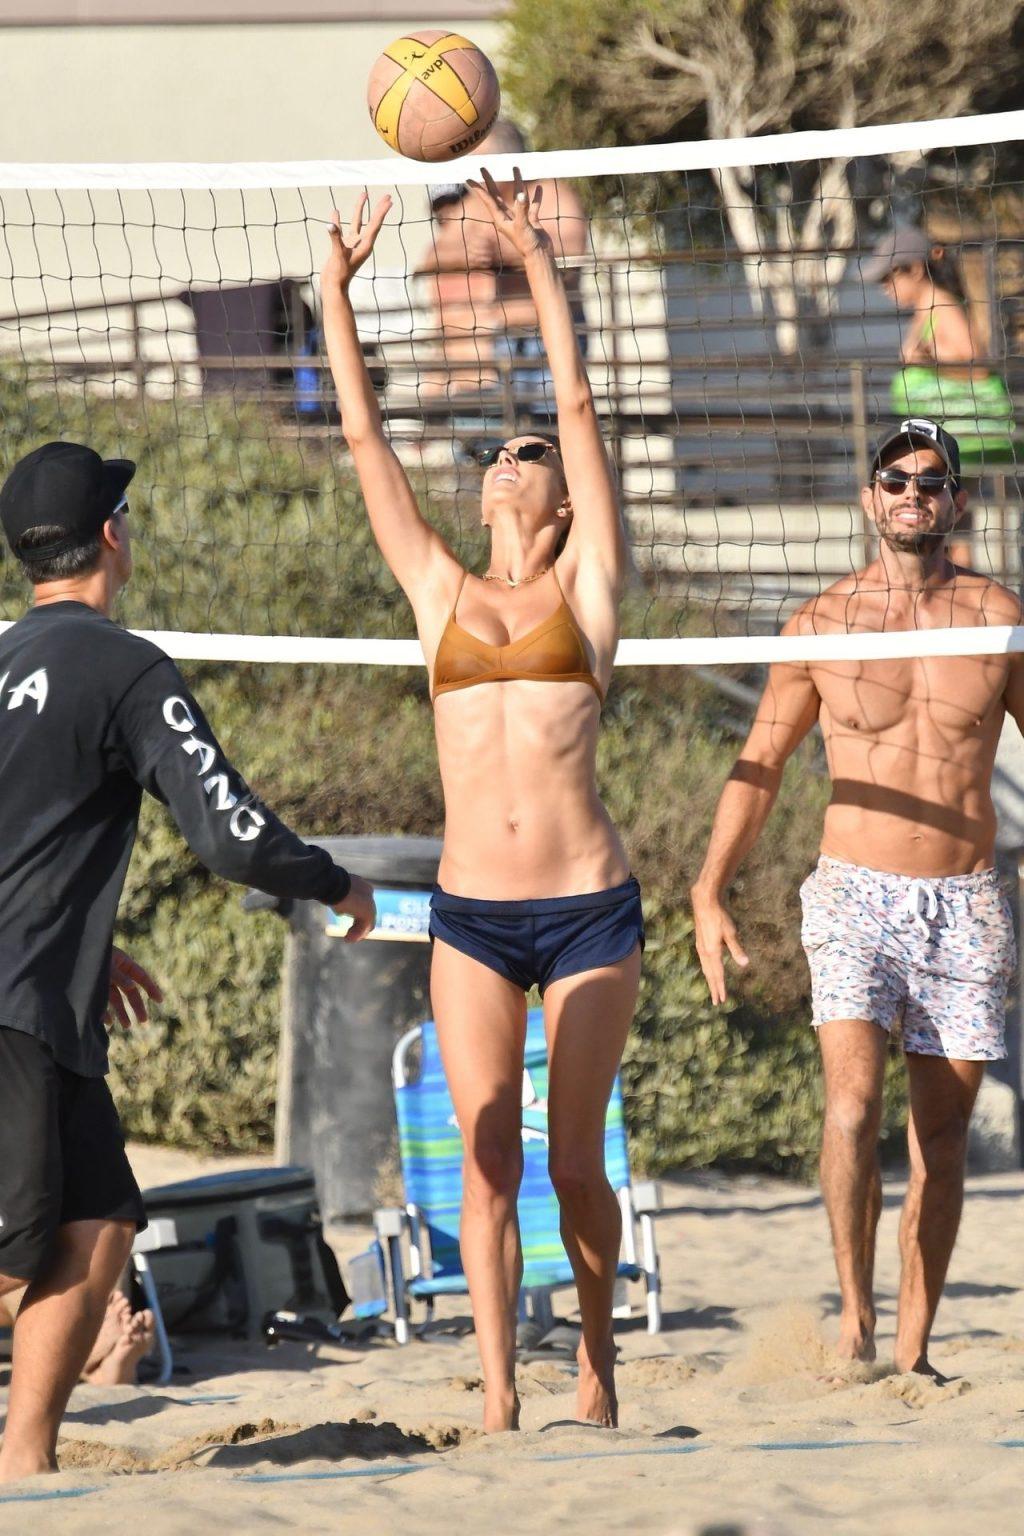 Alessandra Ambrosio Displays Her Slim Figure on the Beach (147 New Photos)